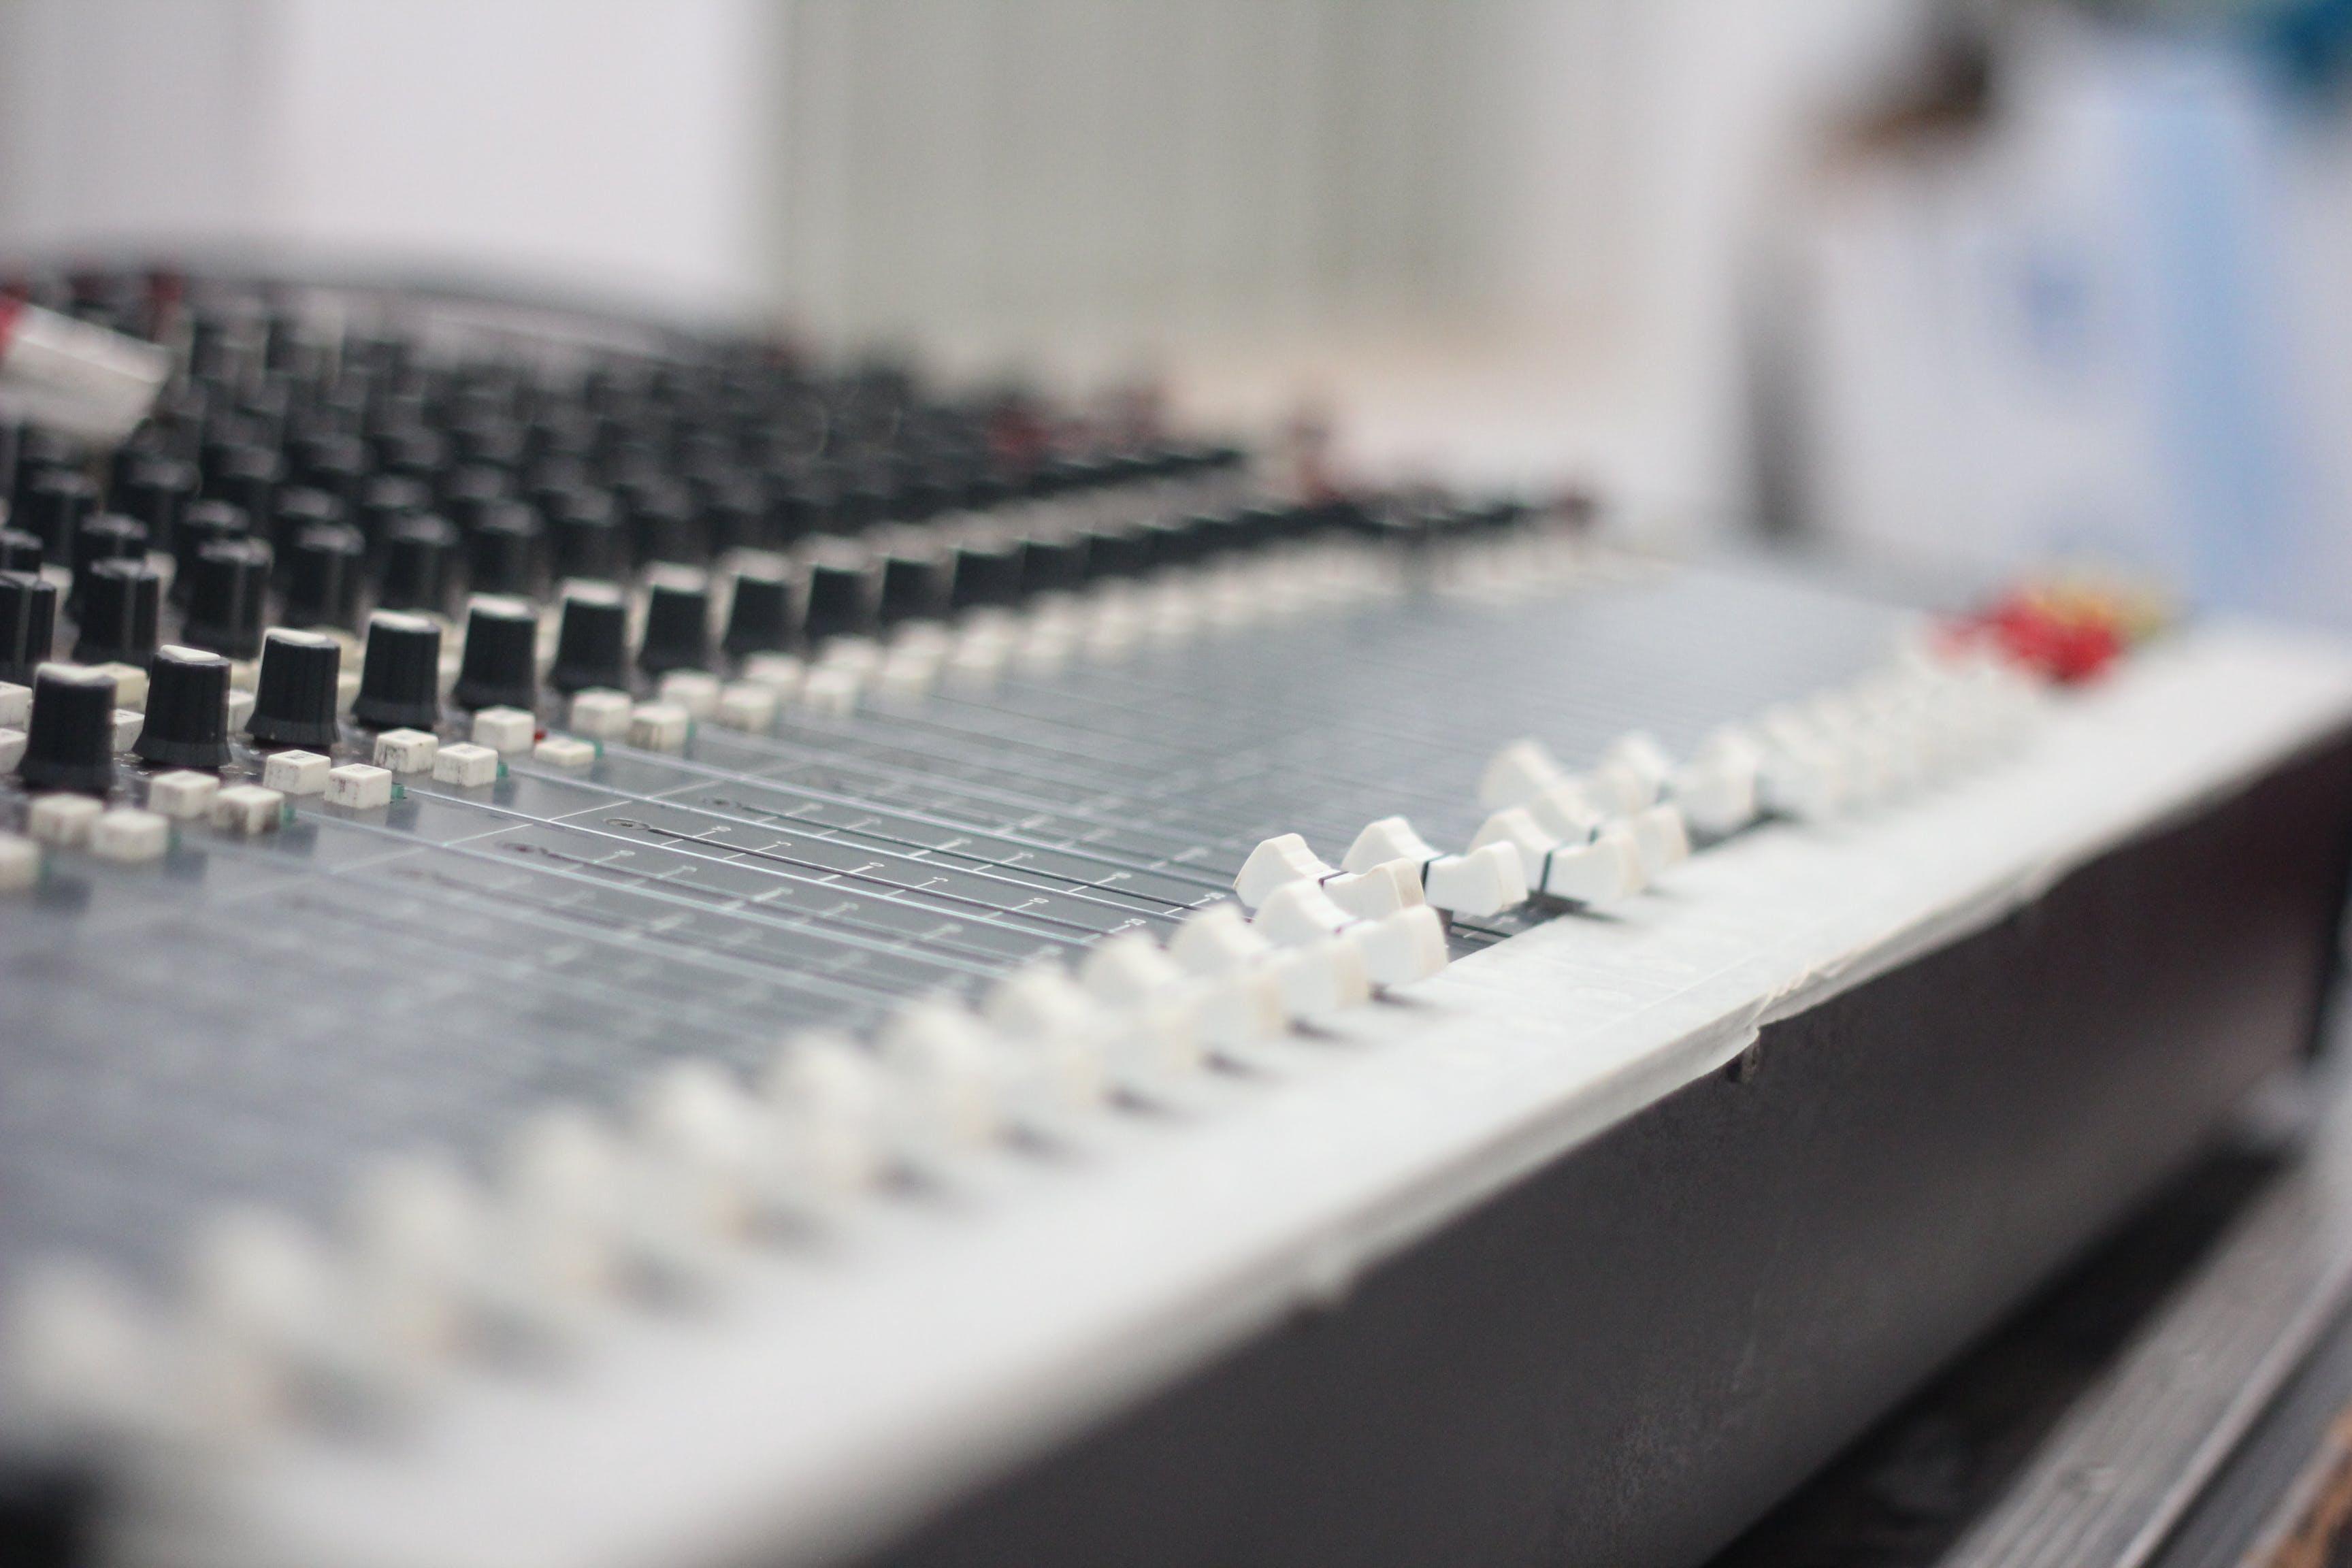 Free stock photo of mixer